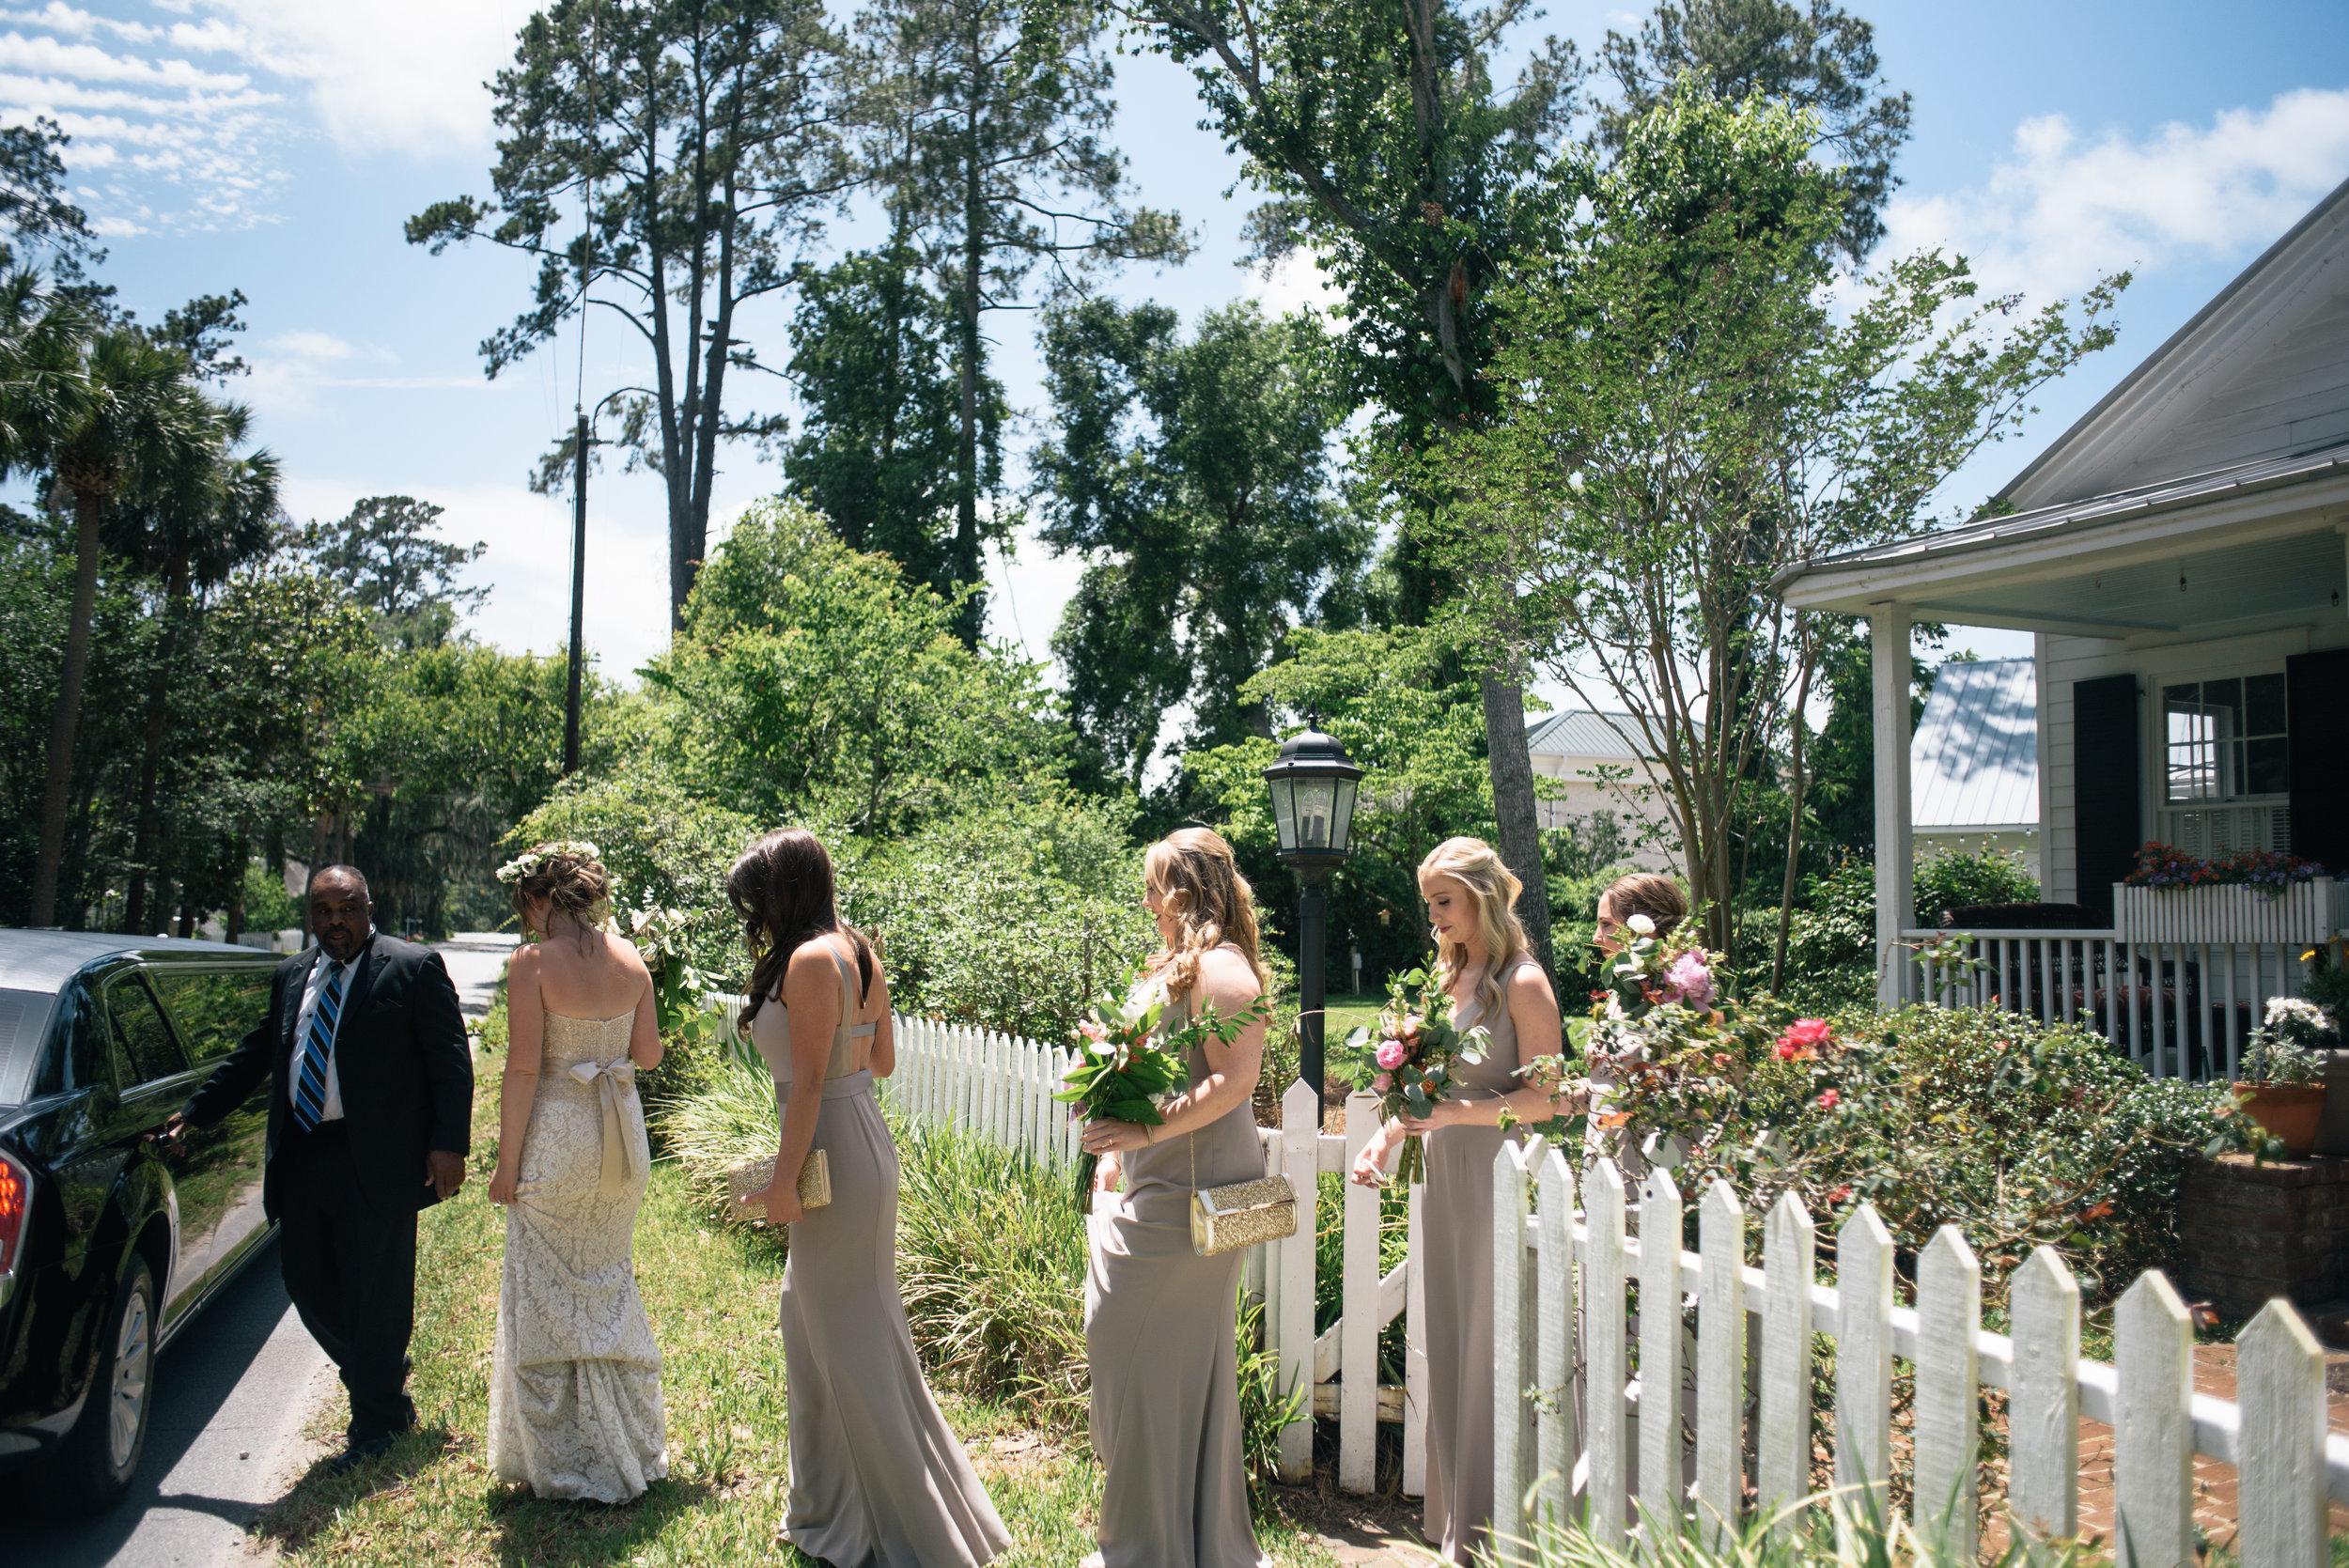 savannah-station-elopement-photographer-savannah-elopement-photography-savannah-georgia-elopement-photographer-savannah-wedding-photographer-meg-hill-photo-jade-hill- (18 of 93).jpg